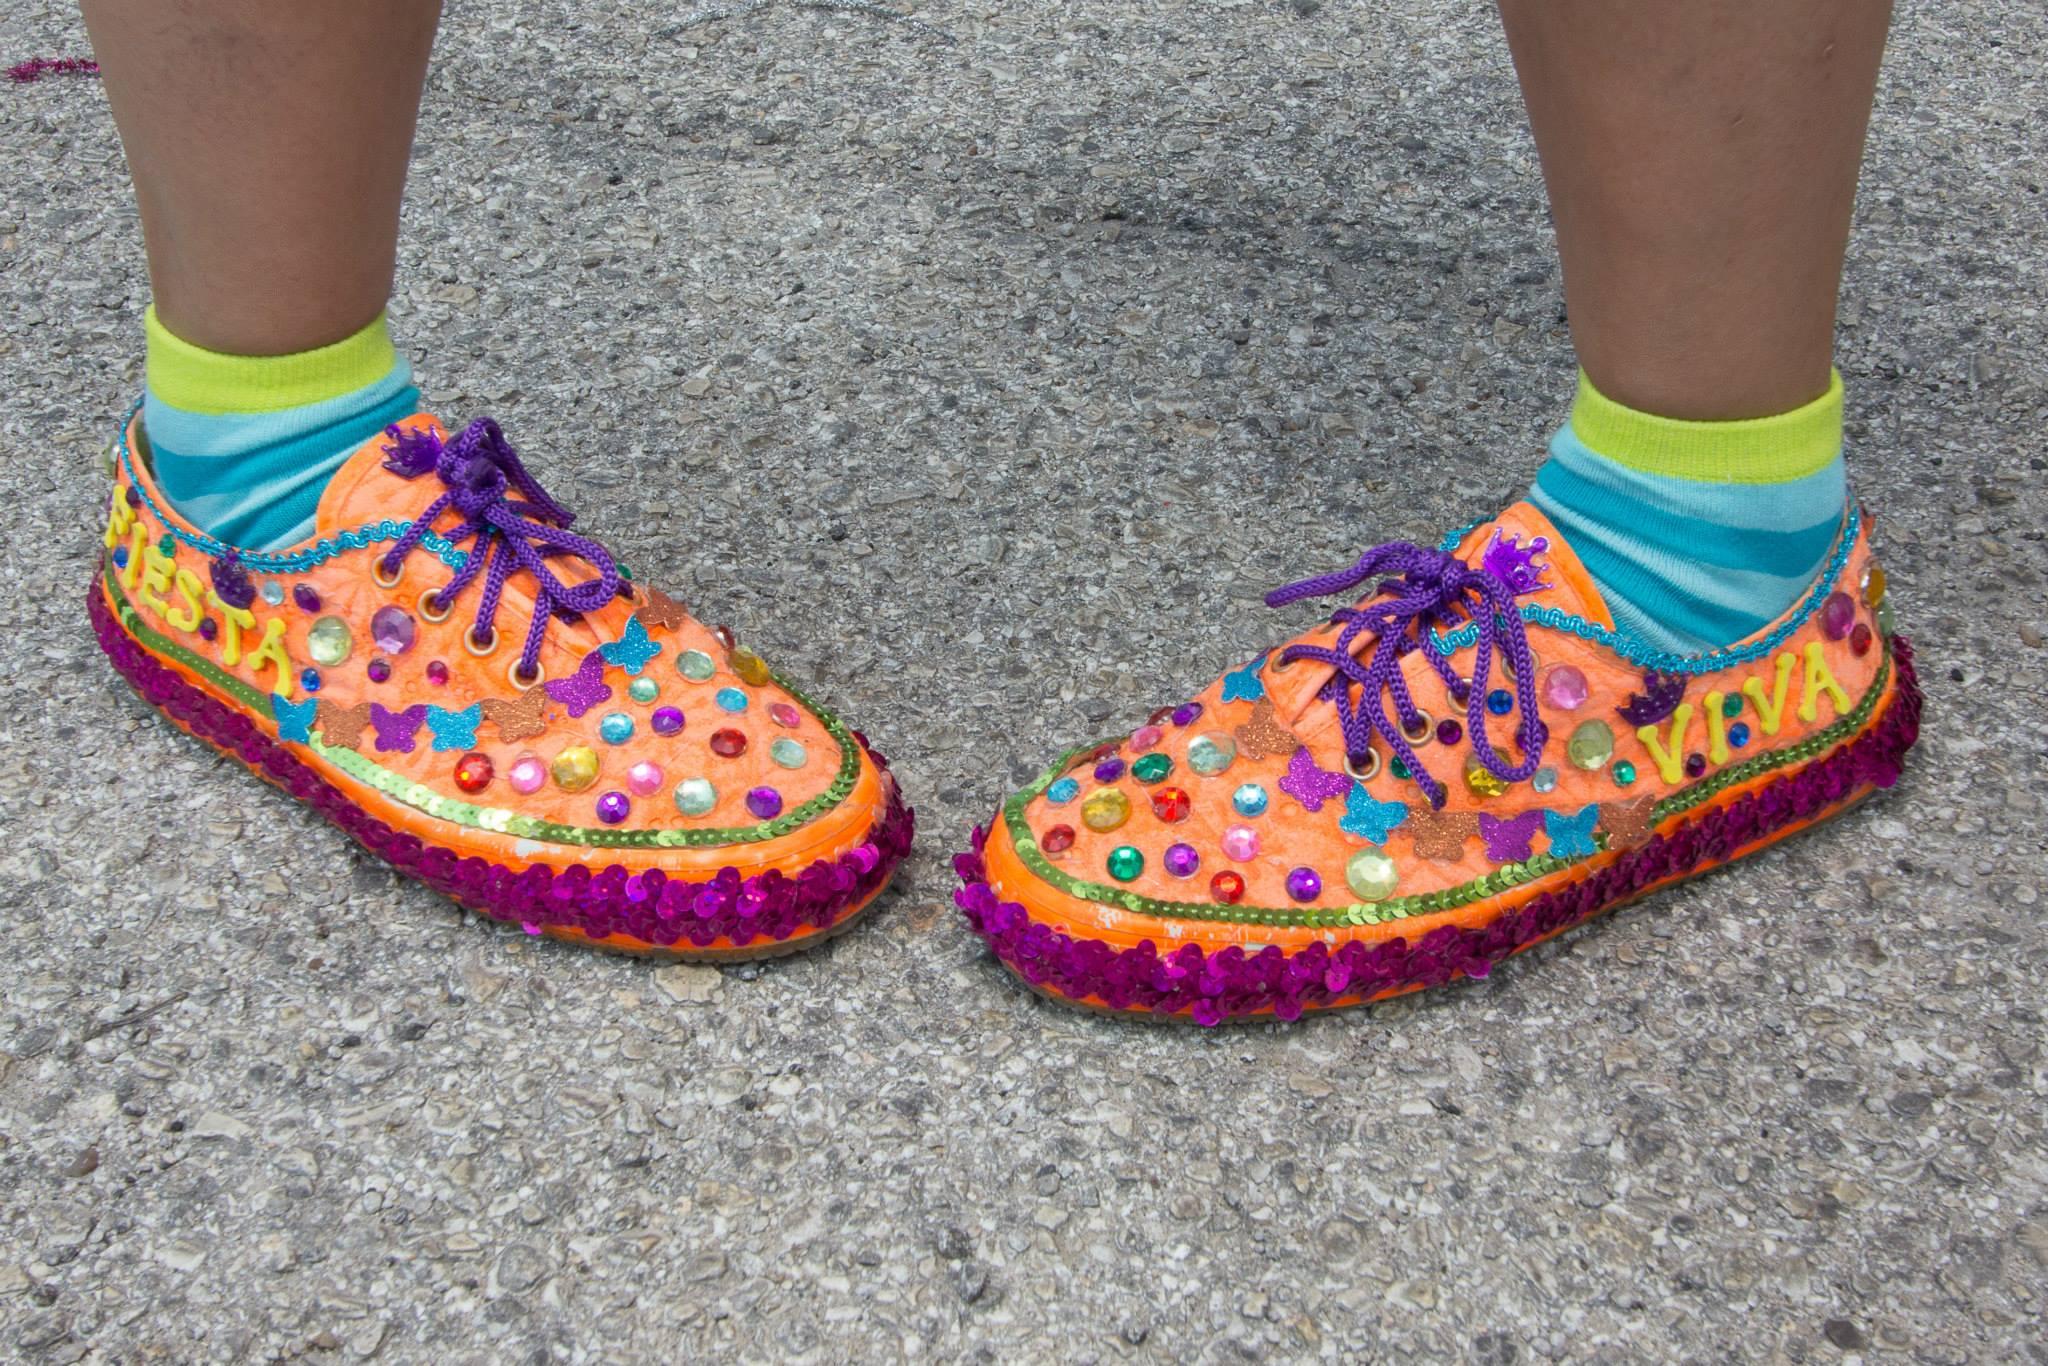 Fiesta 4 Paws 2014 shoe contesst.jpg